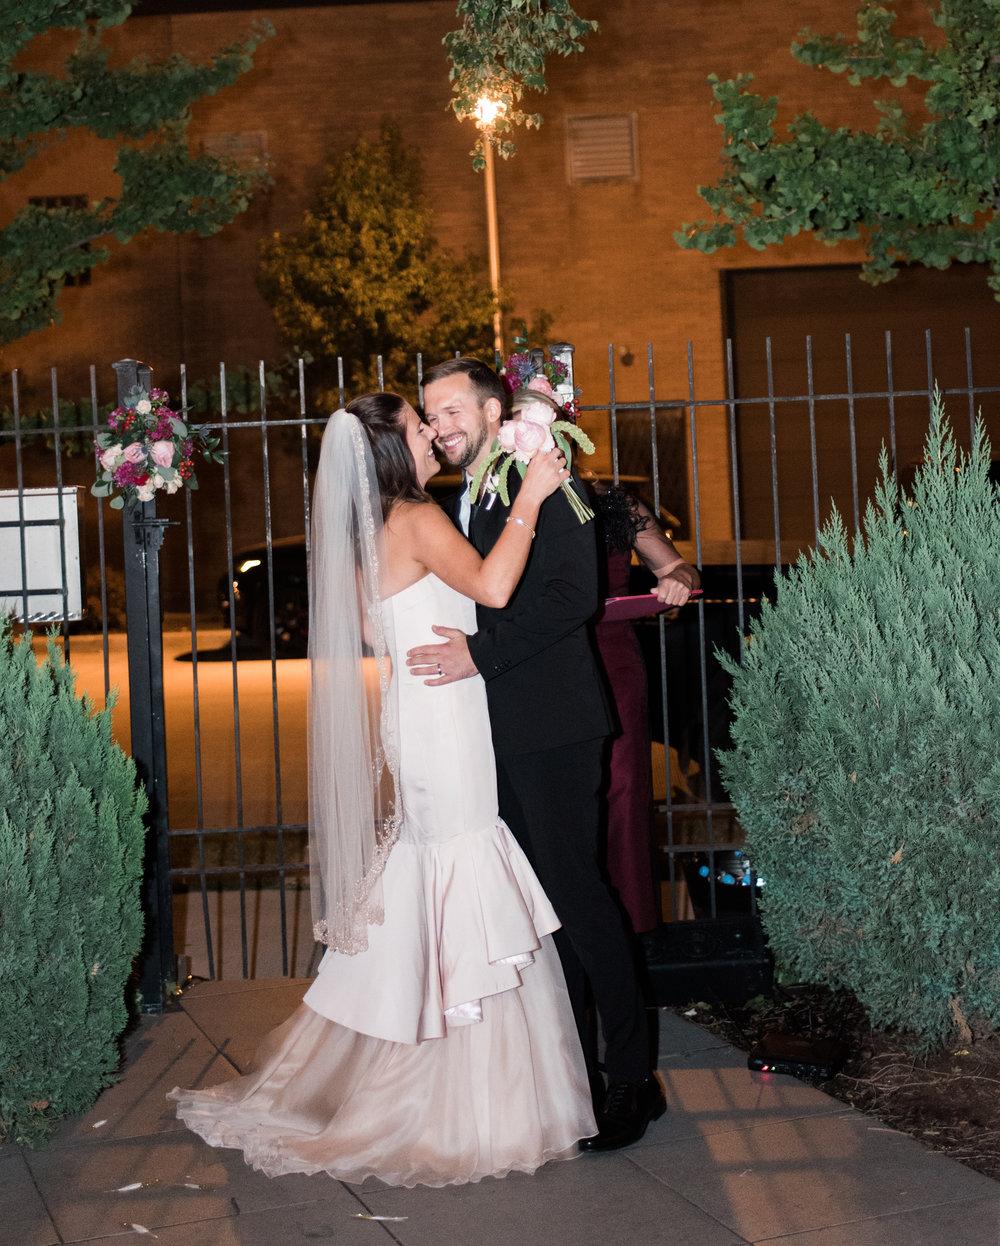 Bonphotage Fine Art Chicago Wedding Photography - Concord 55